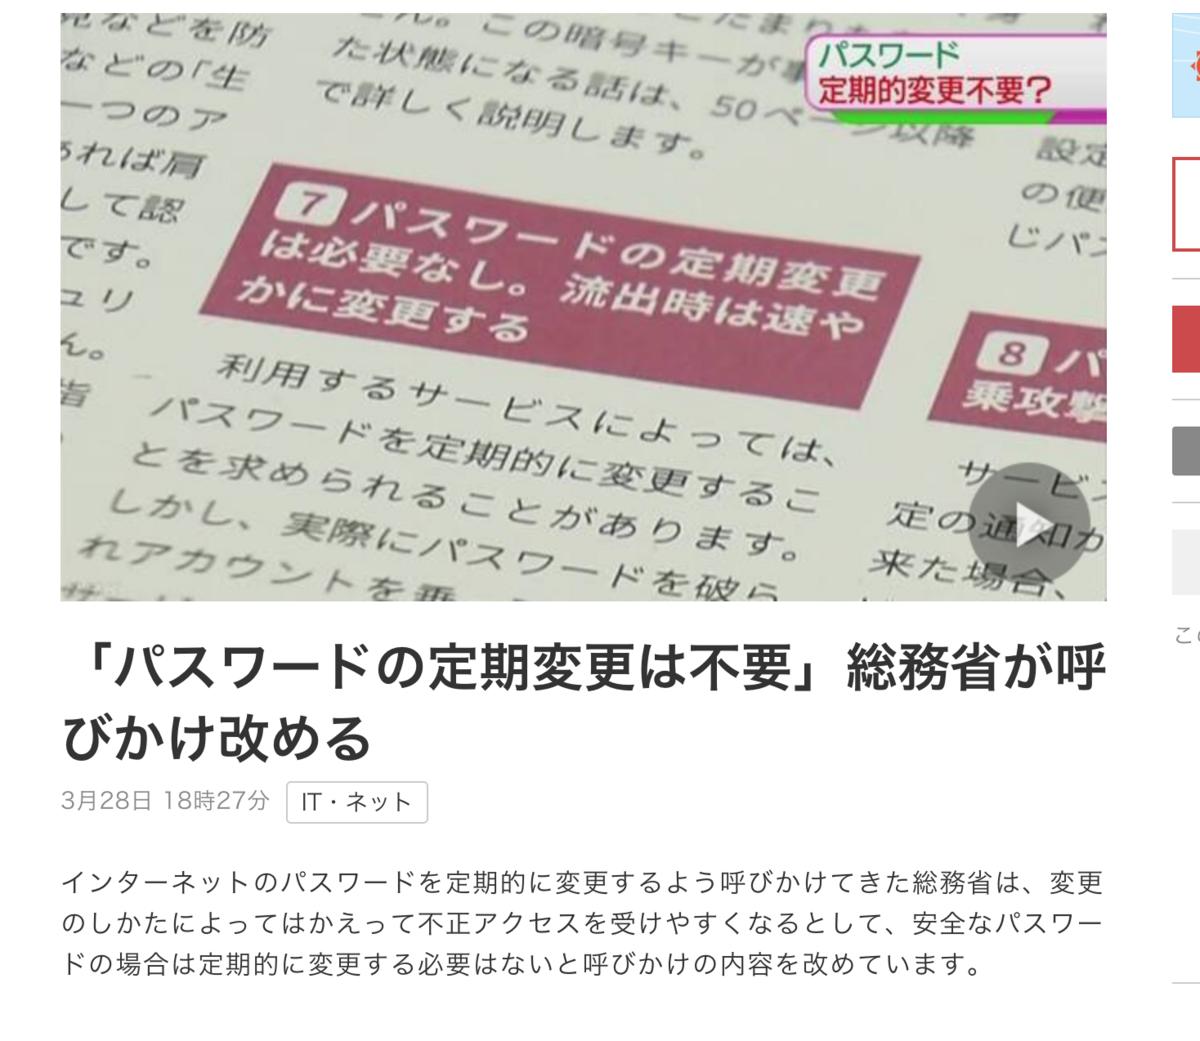 NHK のニュースのTSとm3u8の動画を保存したりしてffmpegで遊ぶ - それ